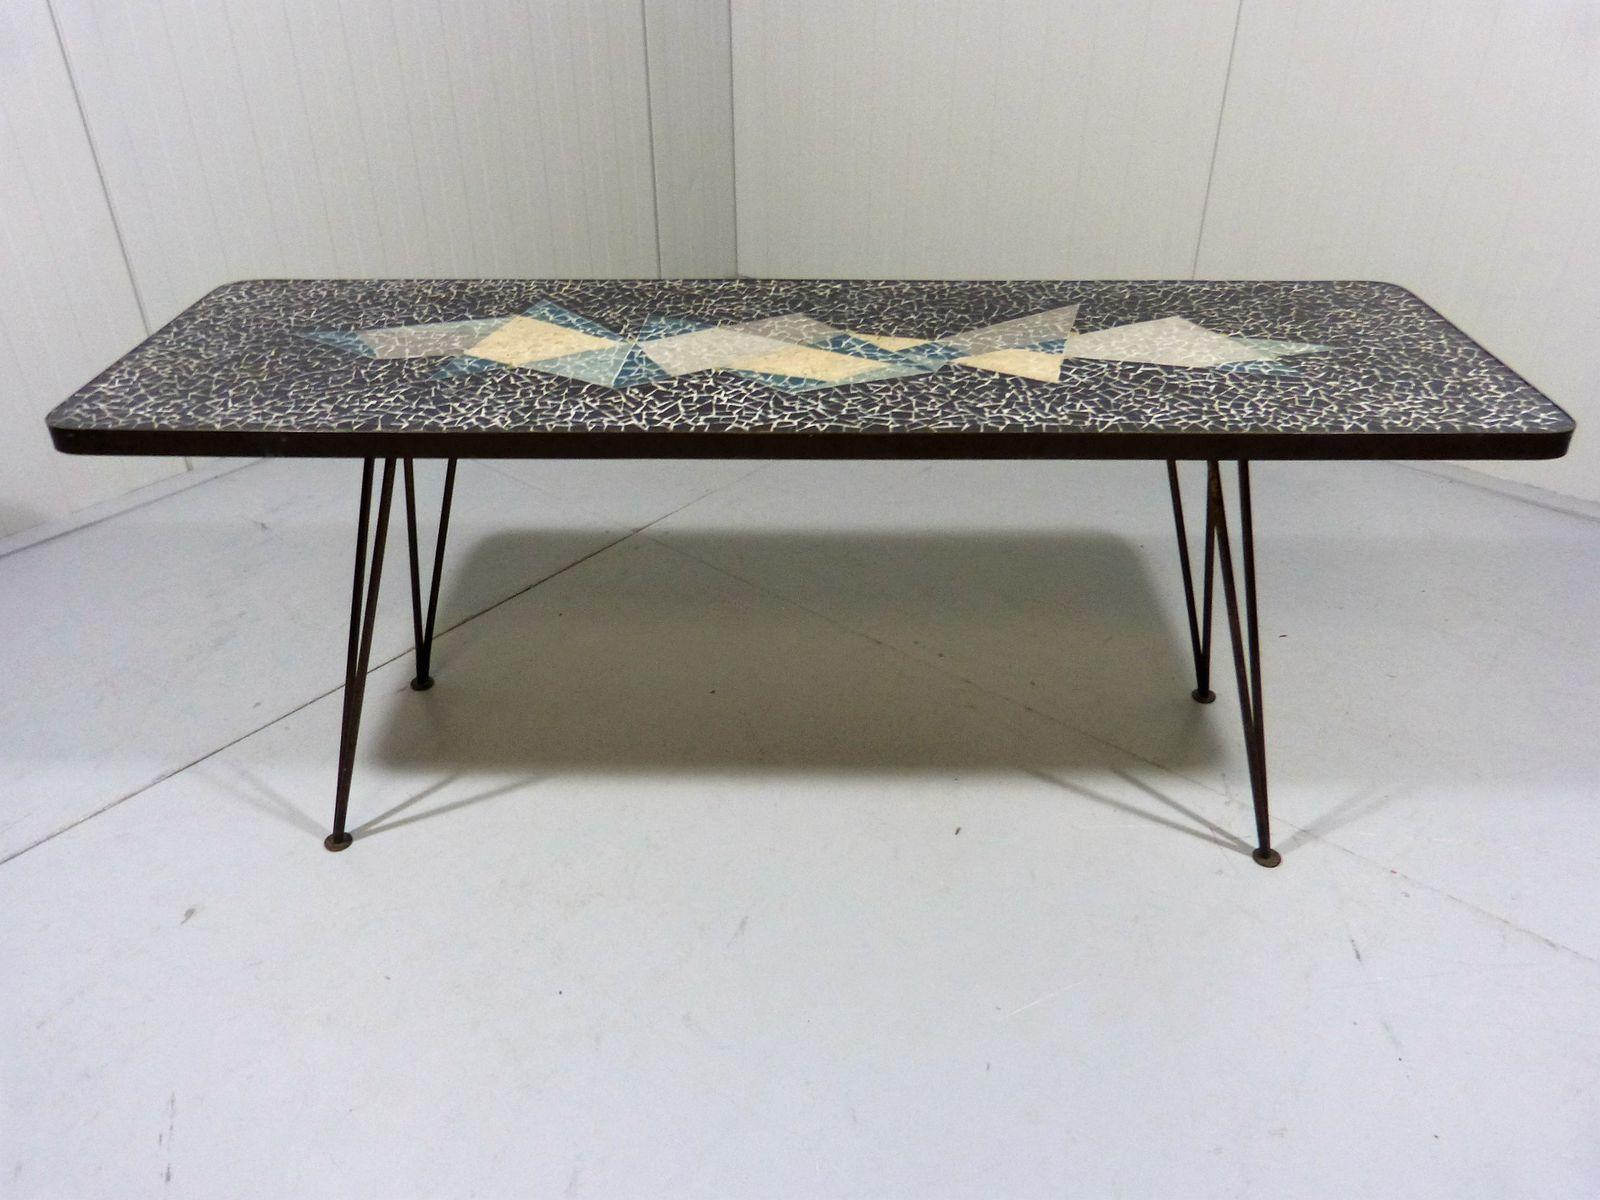 table basse vintage en mosa que 1950s en vente sur pamono. Black Bedroom Furniture Sets. Home Design Ideas